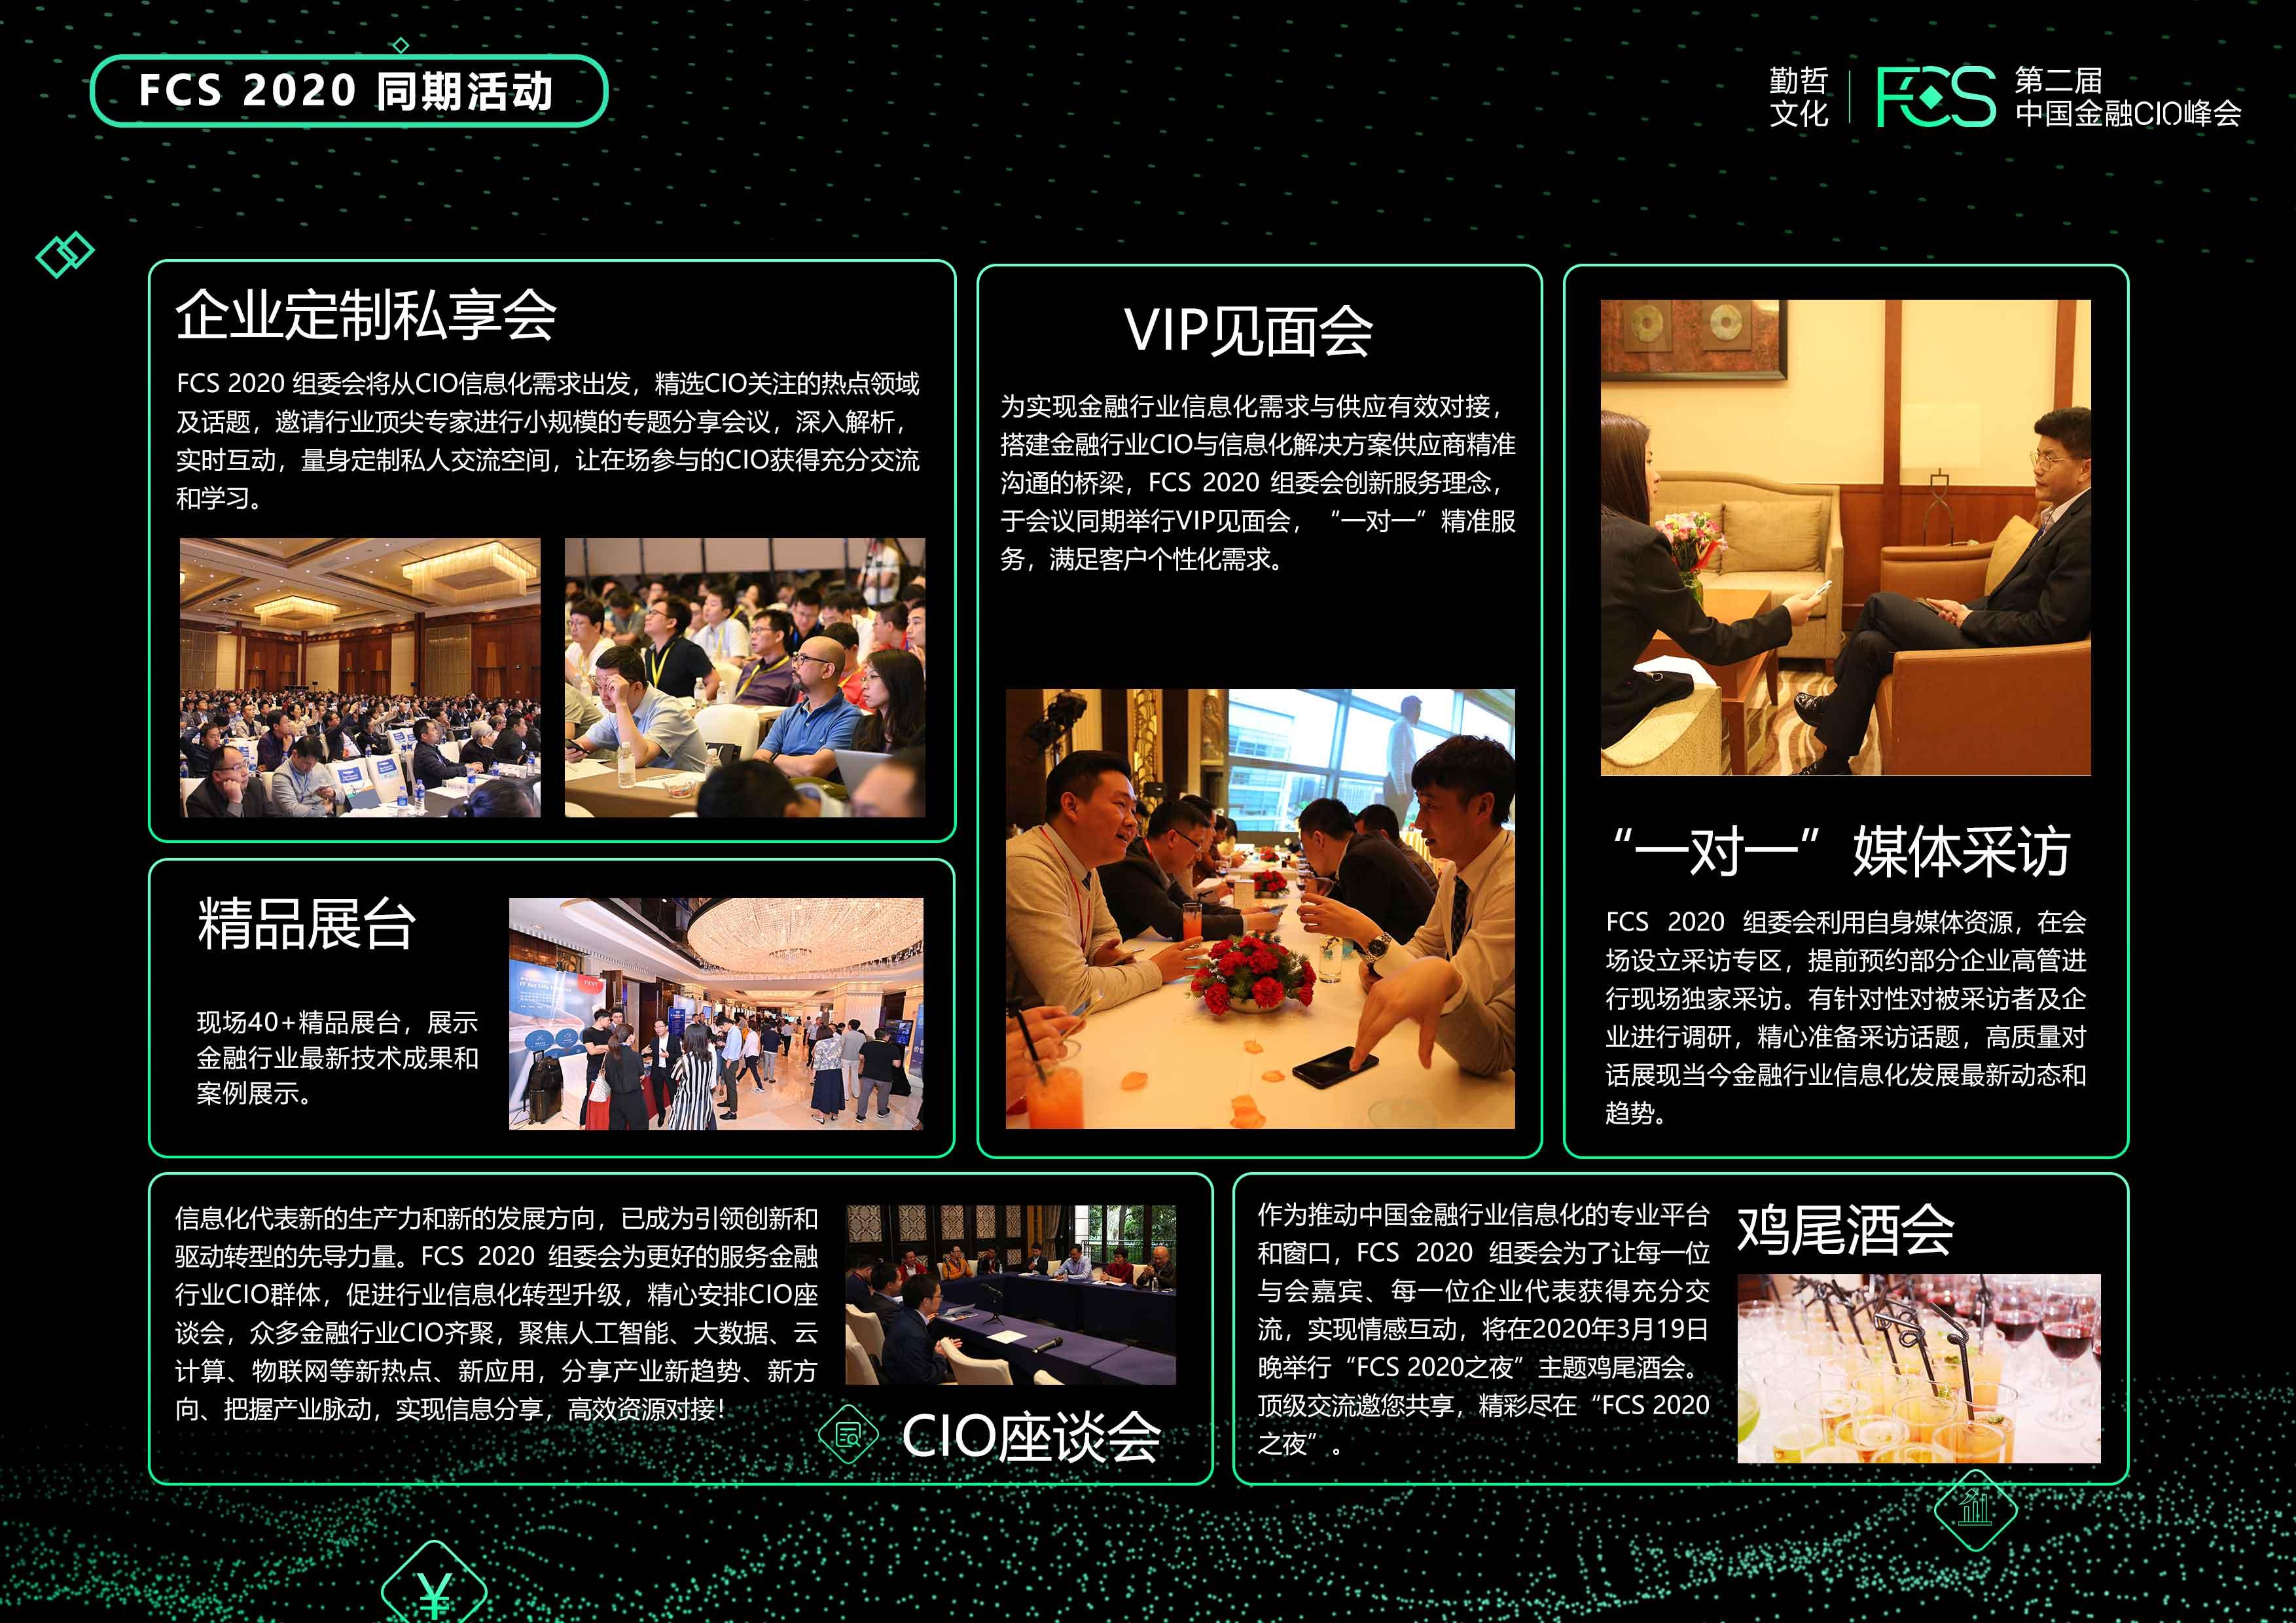 FCS 2020 第二届中国金融CIO峰会(杭州)